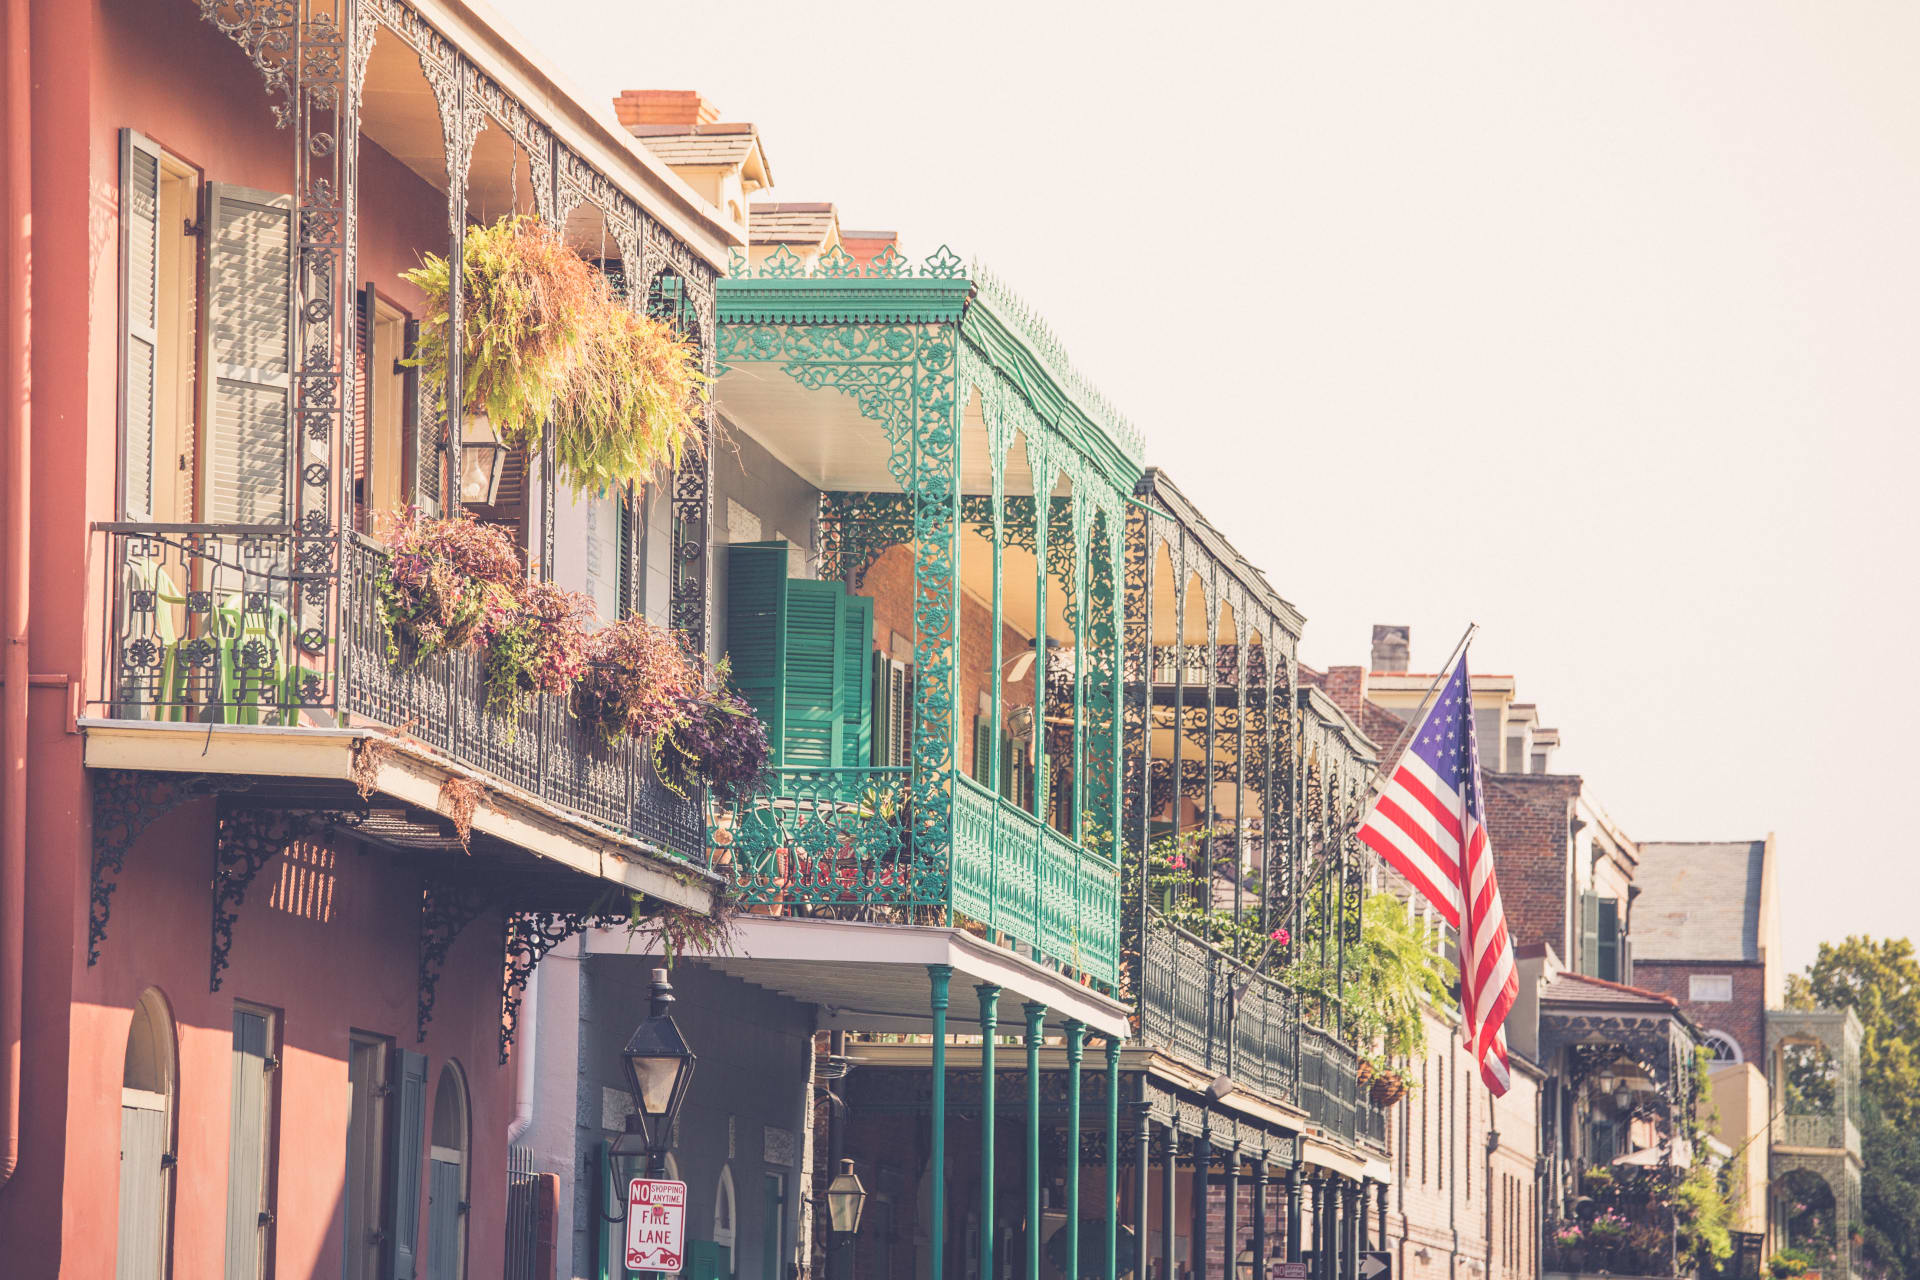 New Orleans - French Quarter - Royal Street